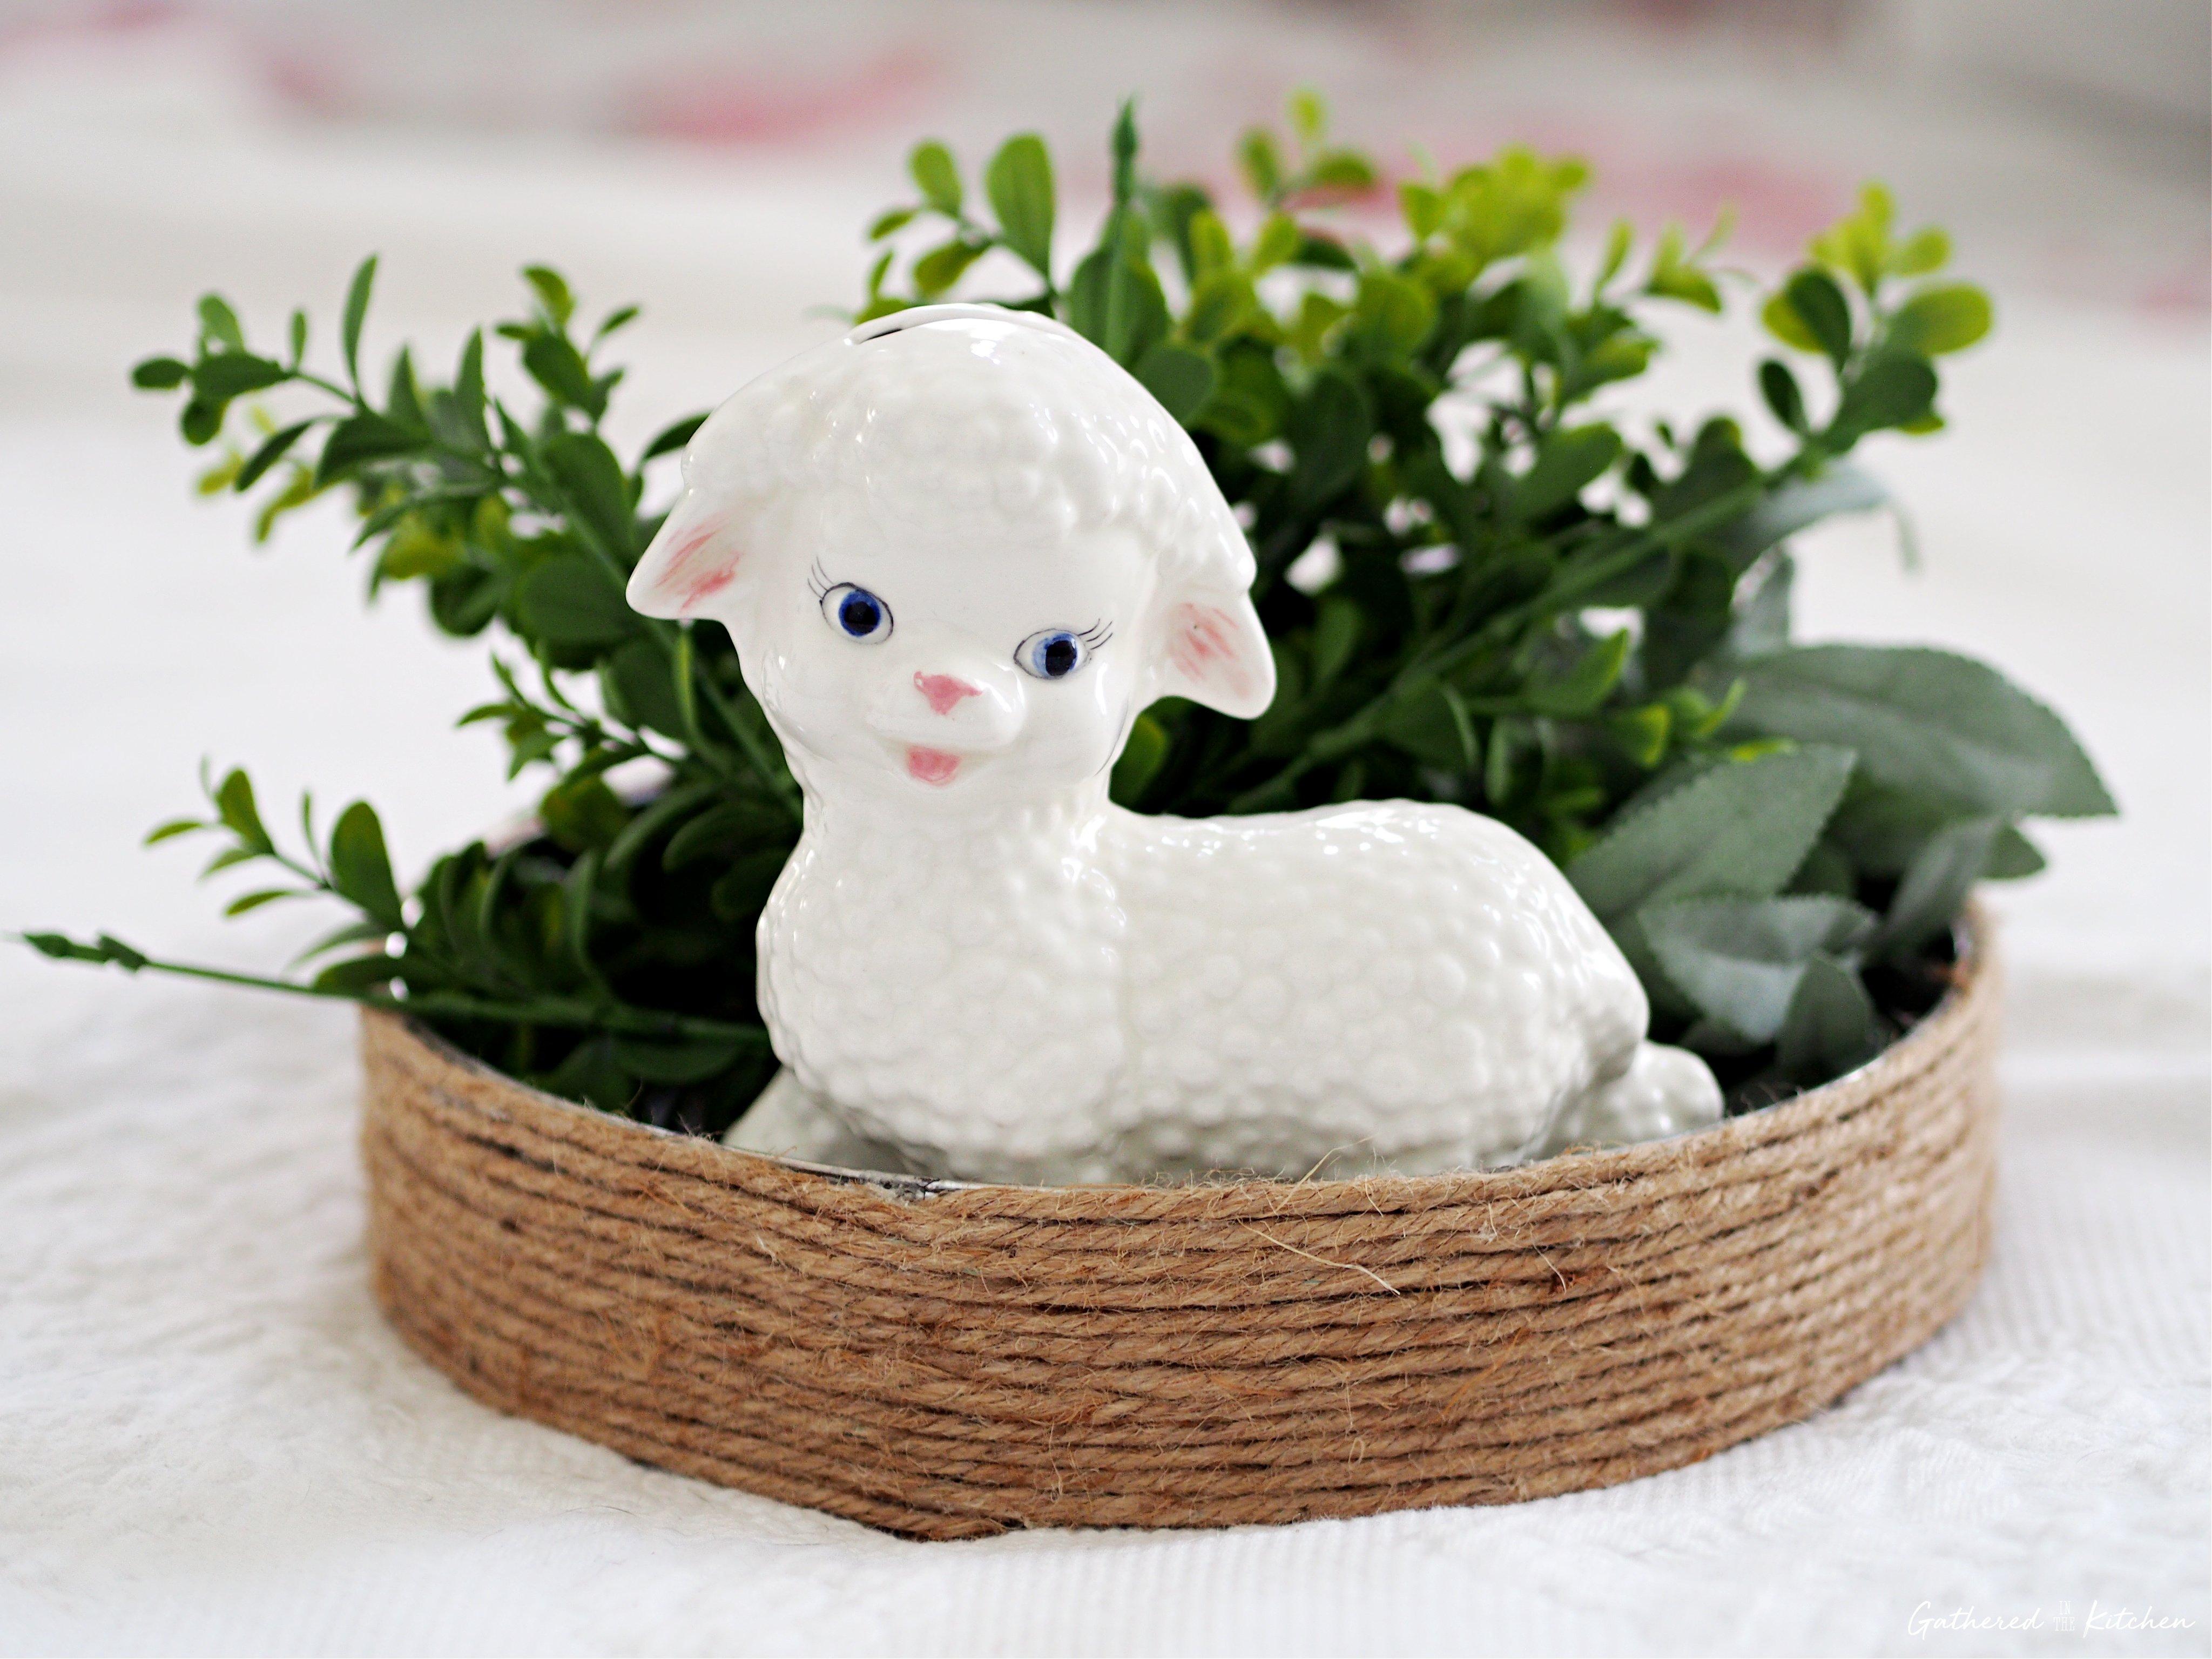 ceramic lamb with greenery behind it